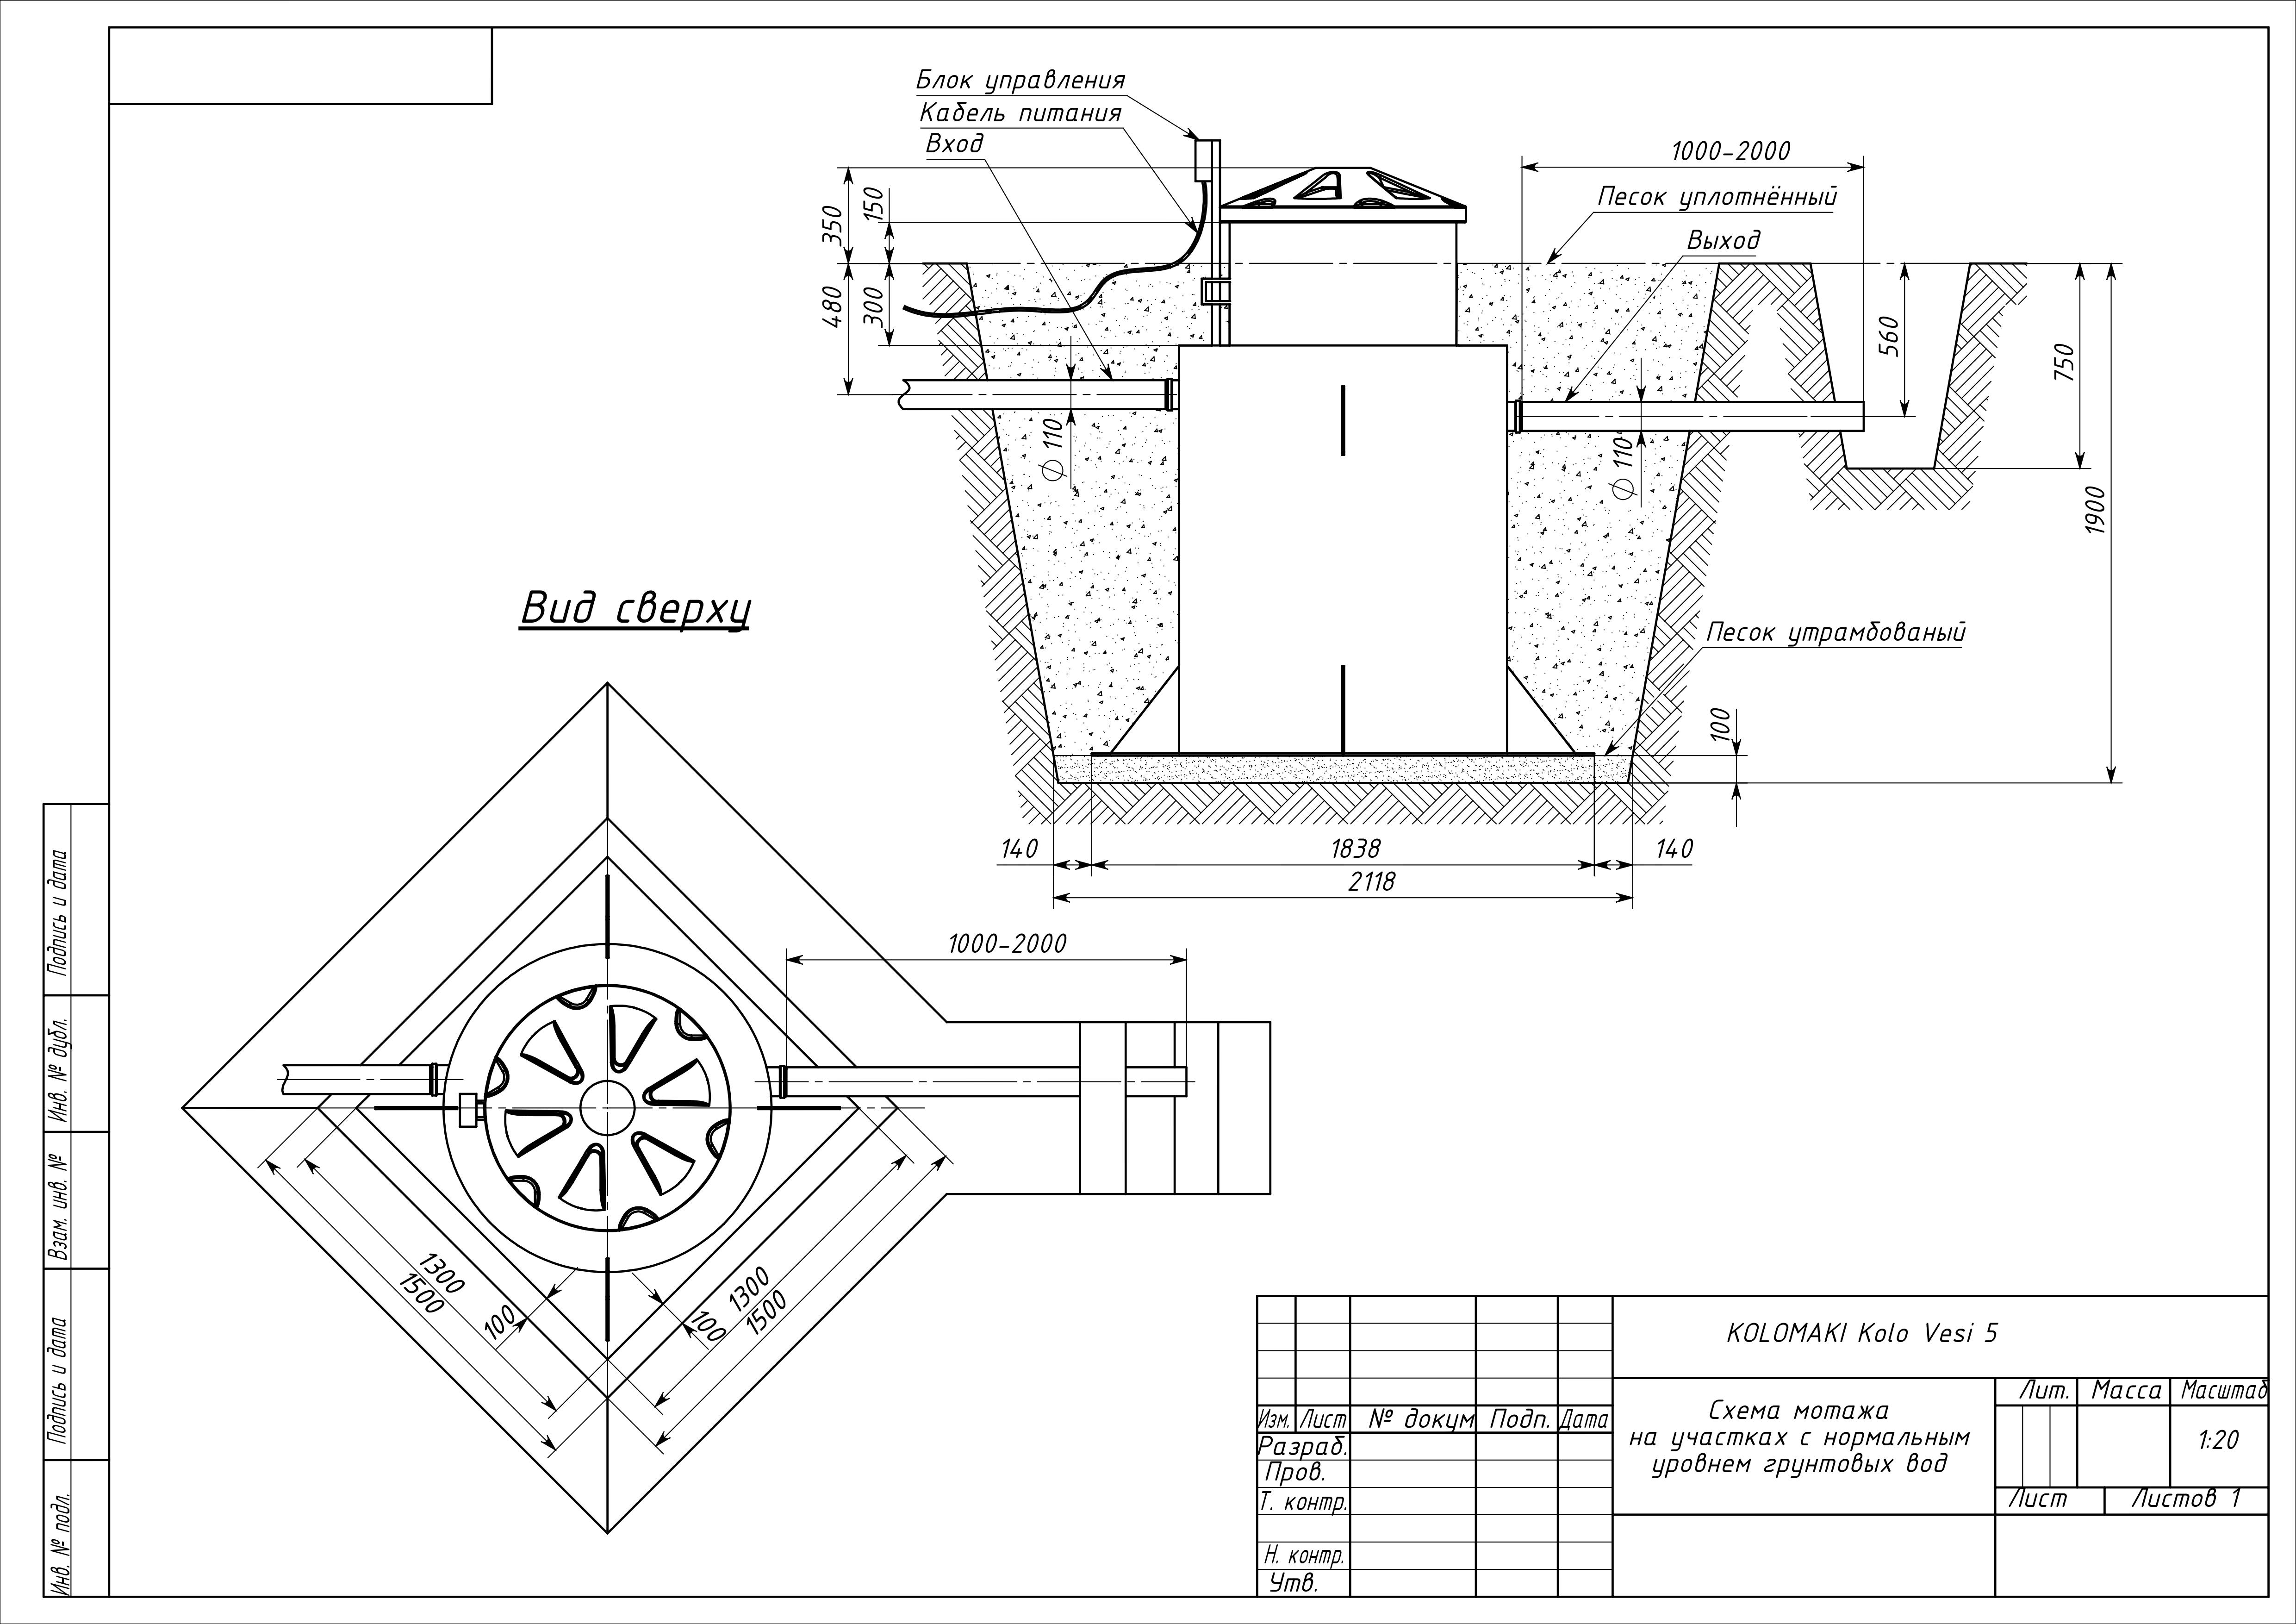 Монтажная схема септика Коловеси 5